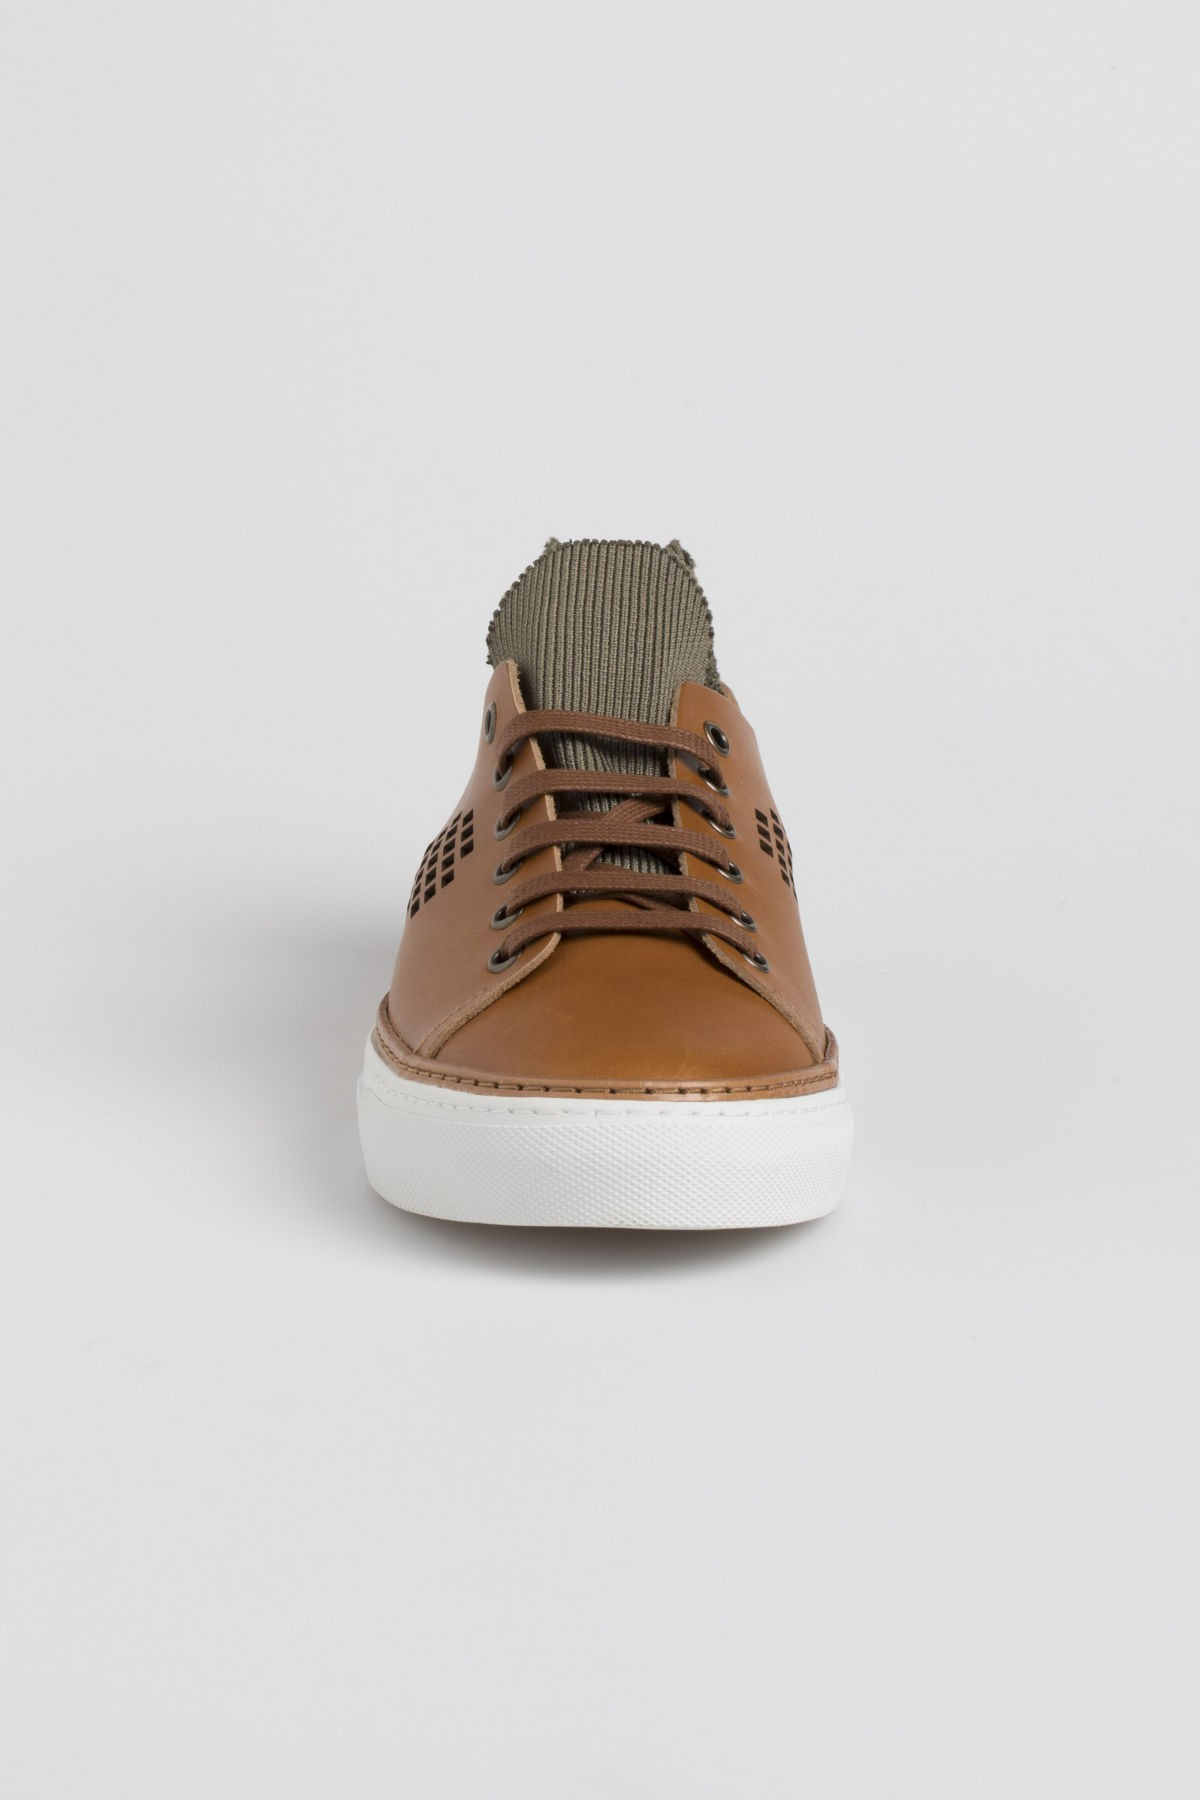 AMBASSADOR Shoes for man BEPOSITIVE